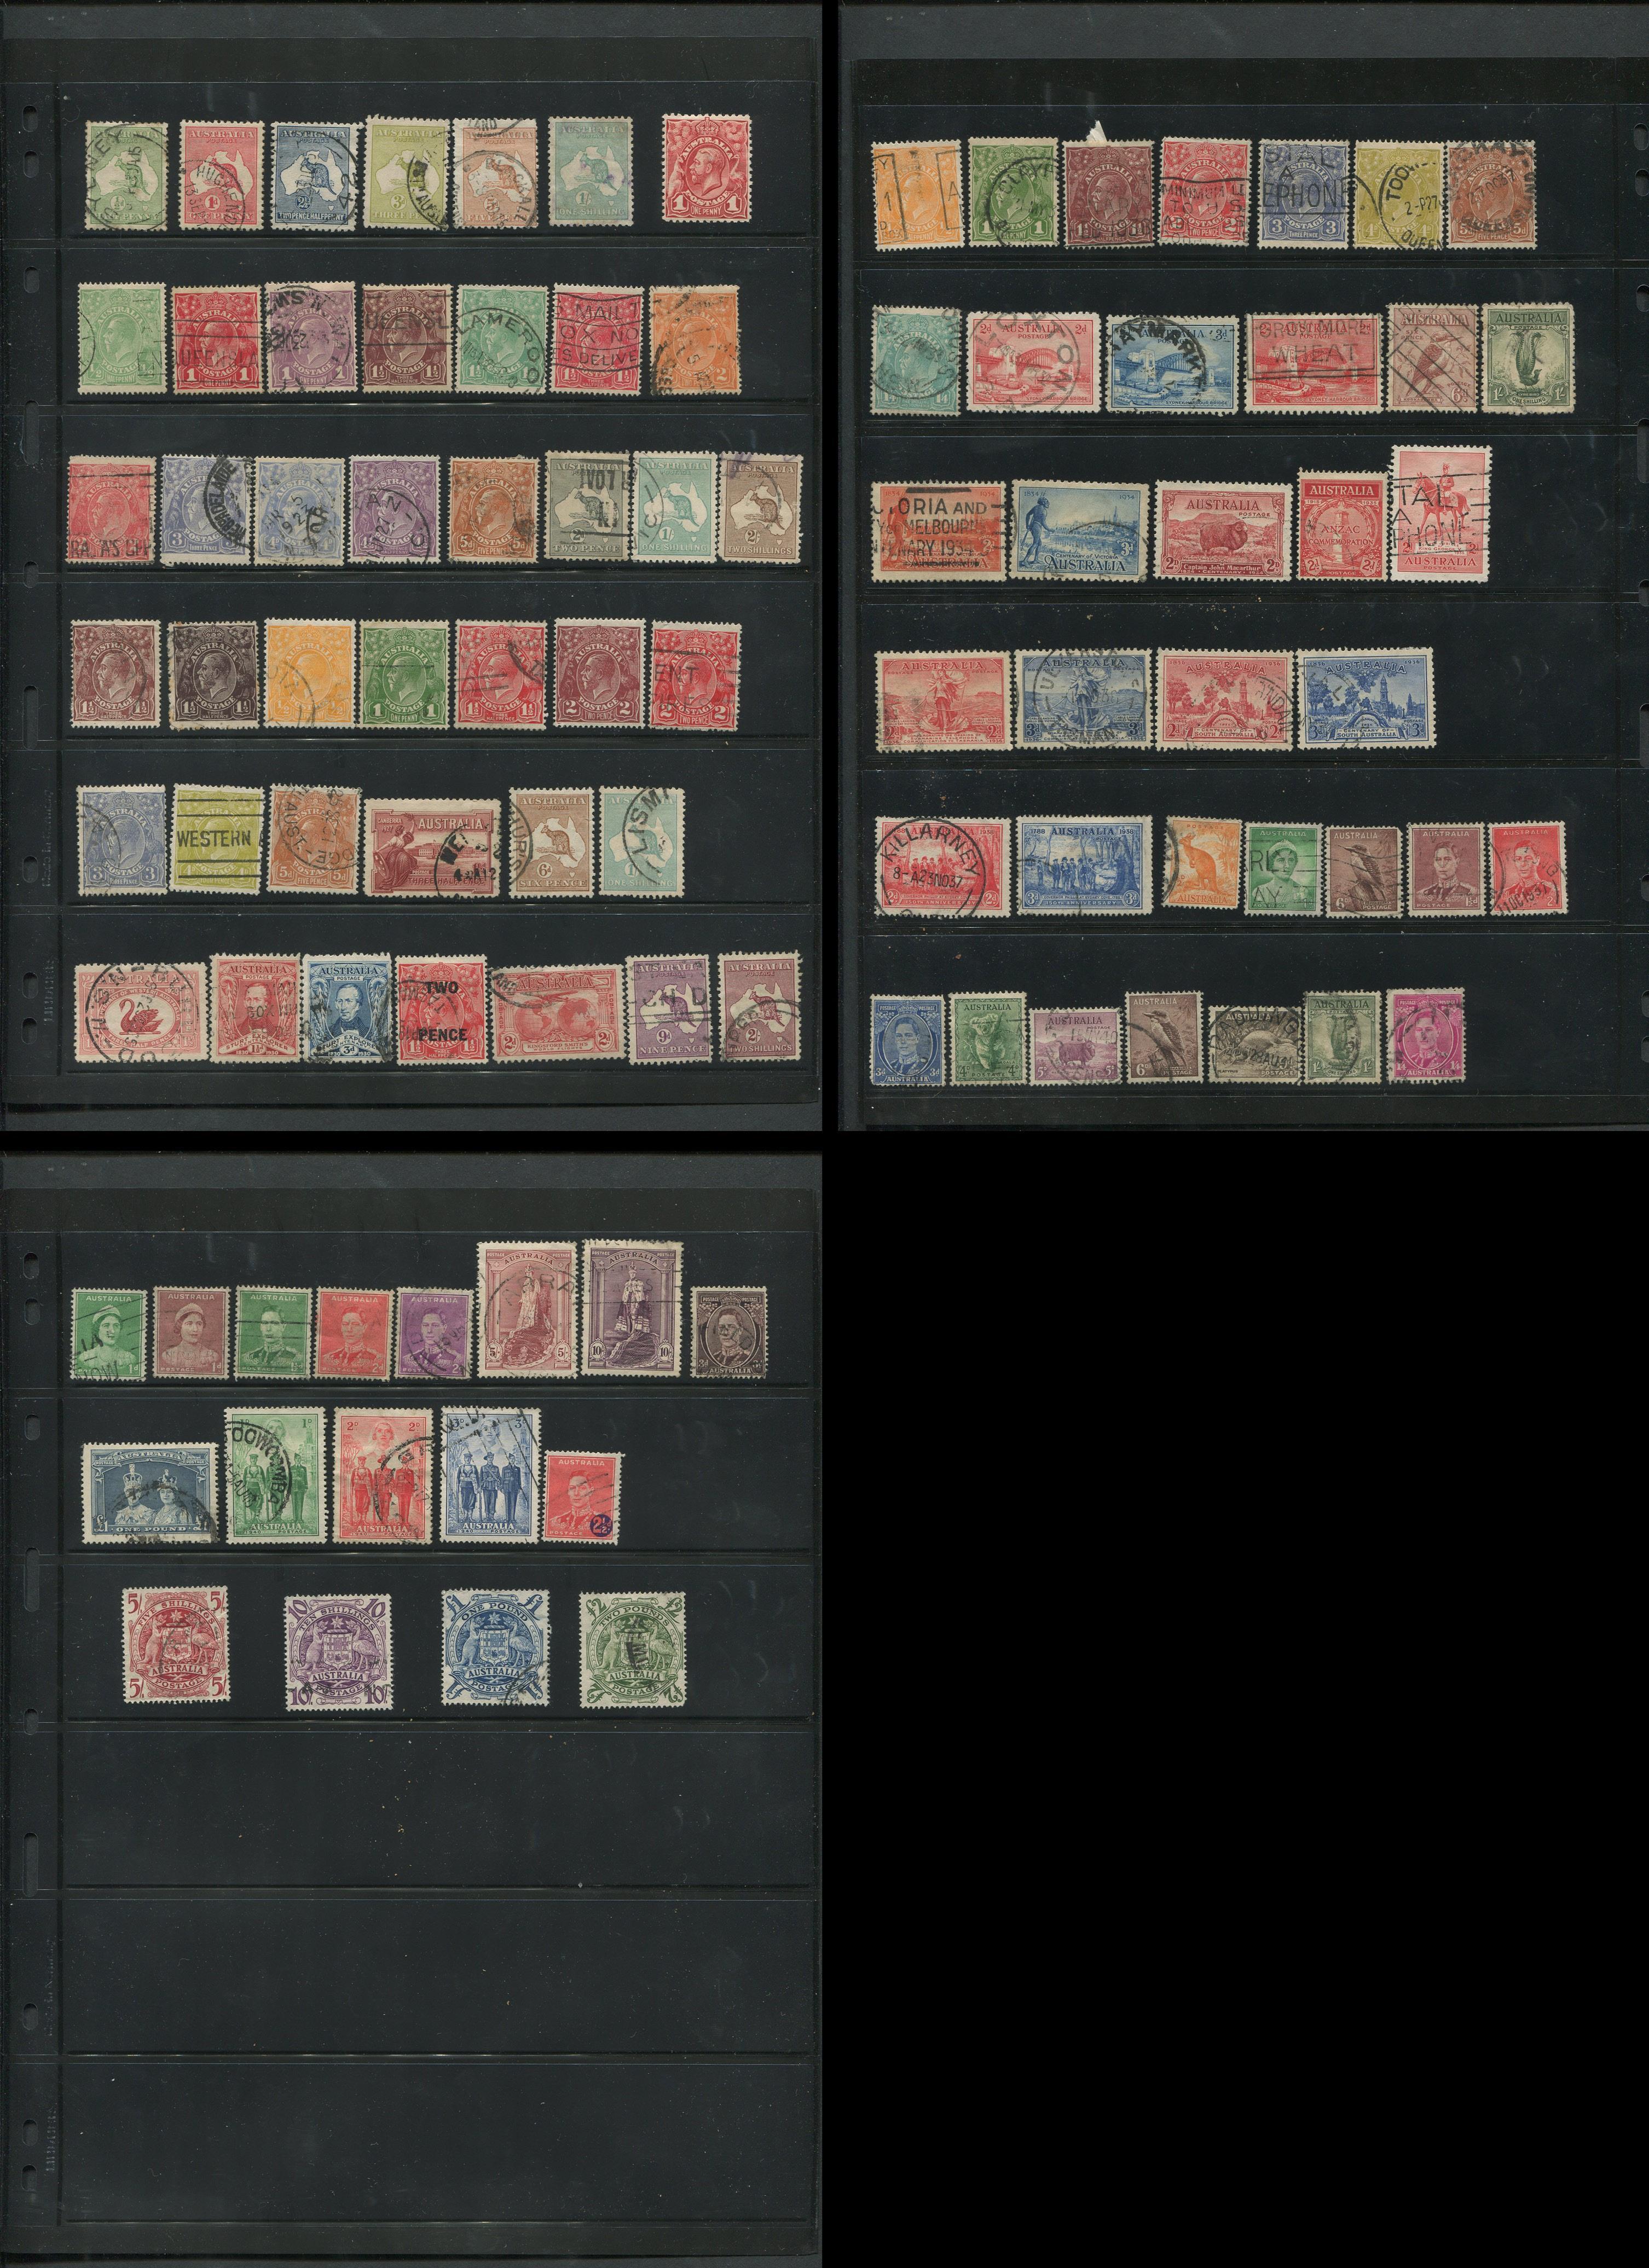 Australia 1913-49 Stamp Collection